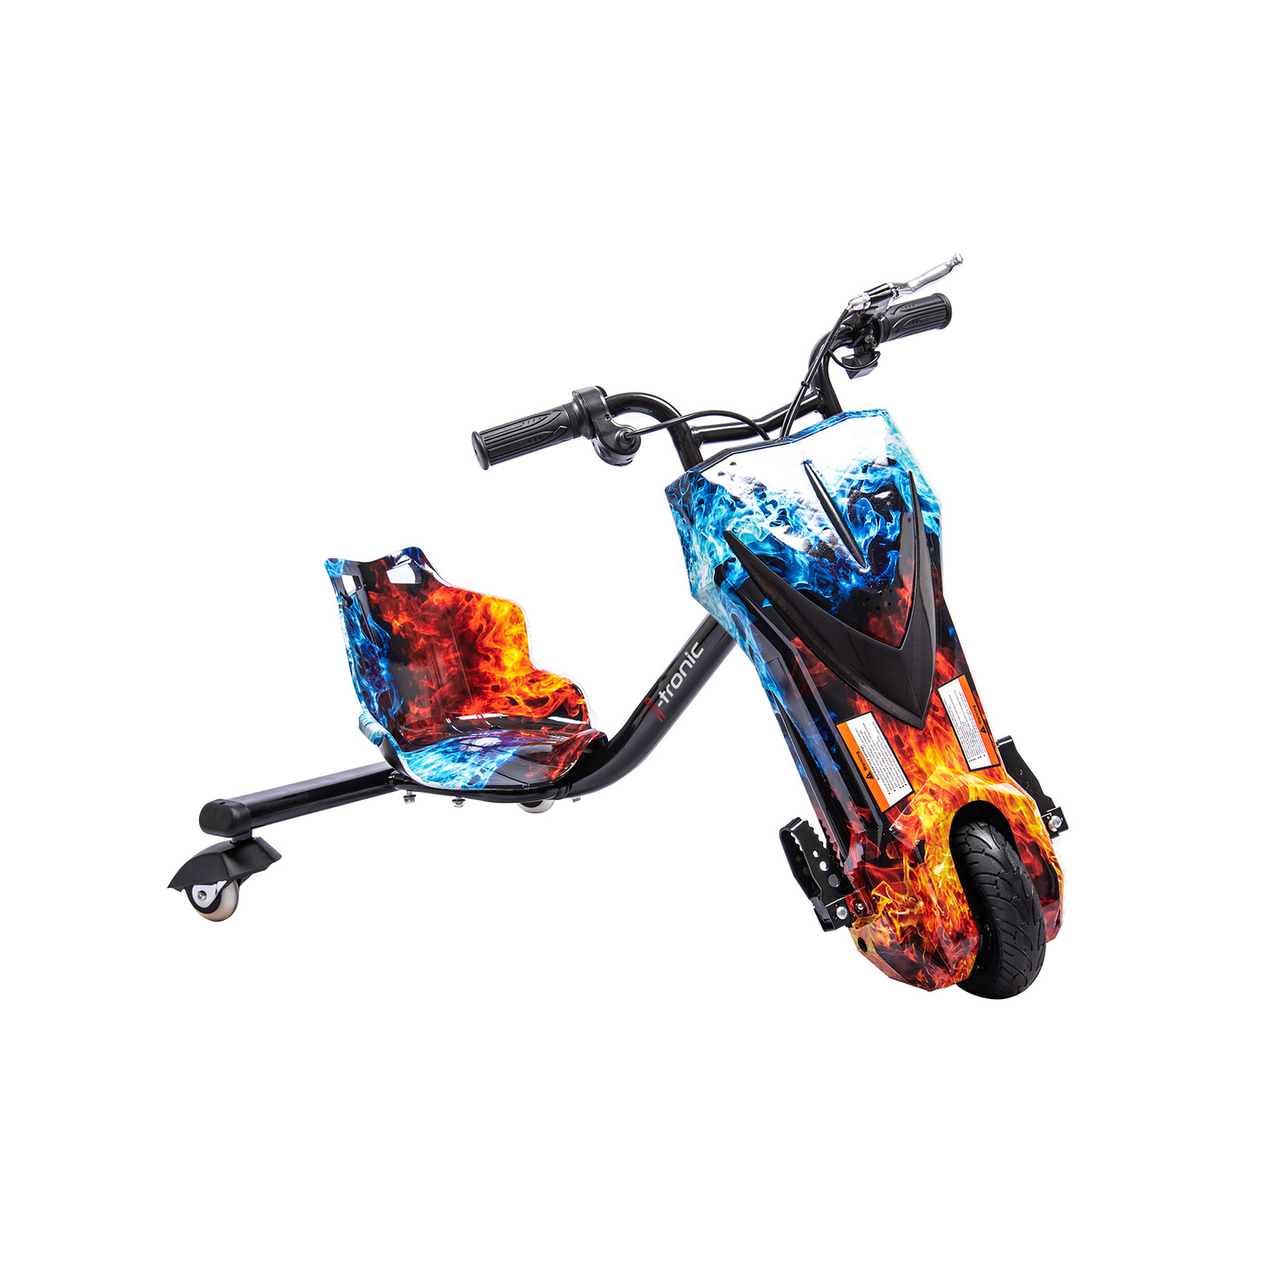 Elektrische Drift Trike Kart Vlammen Rood Blauw Linexstore Linexstore Com